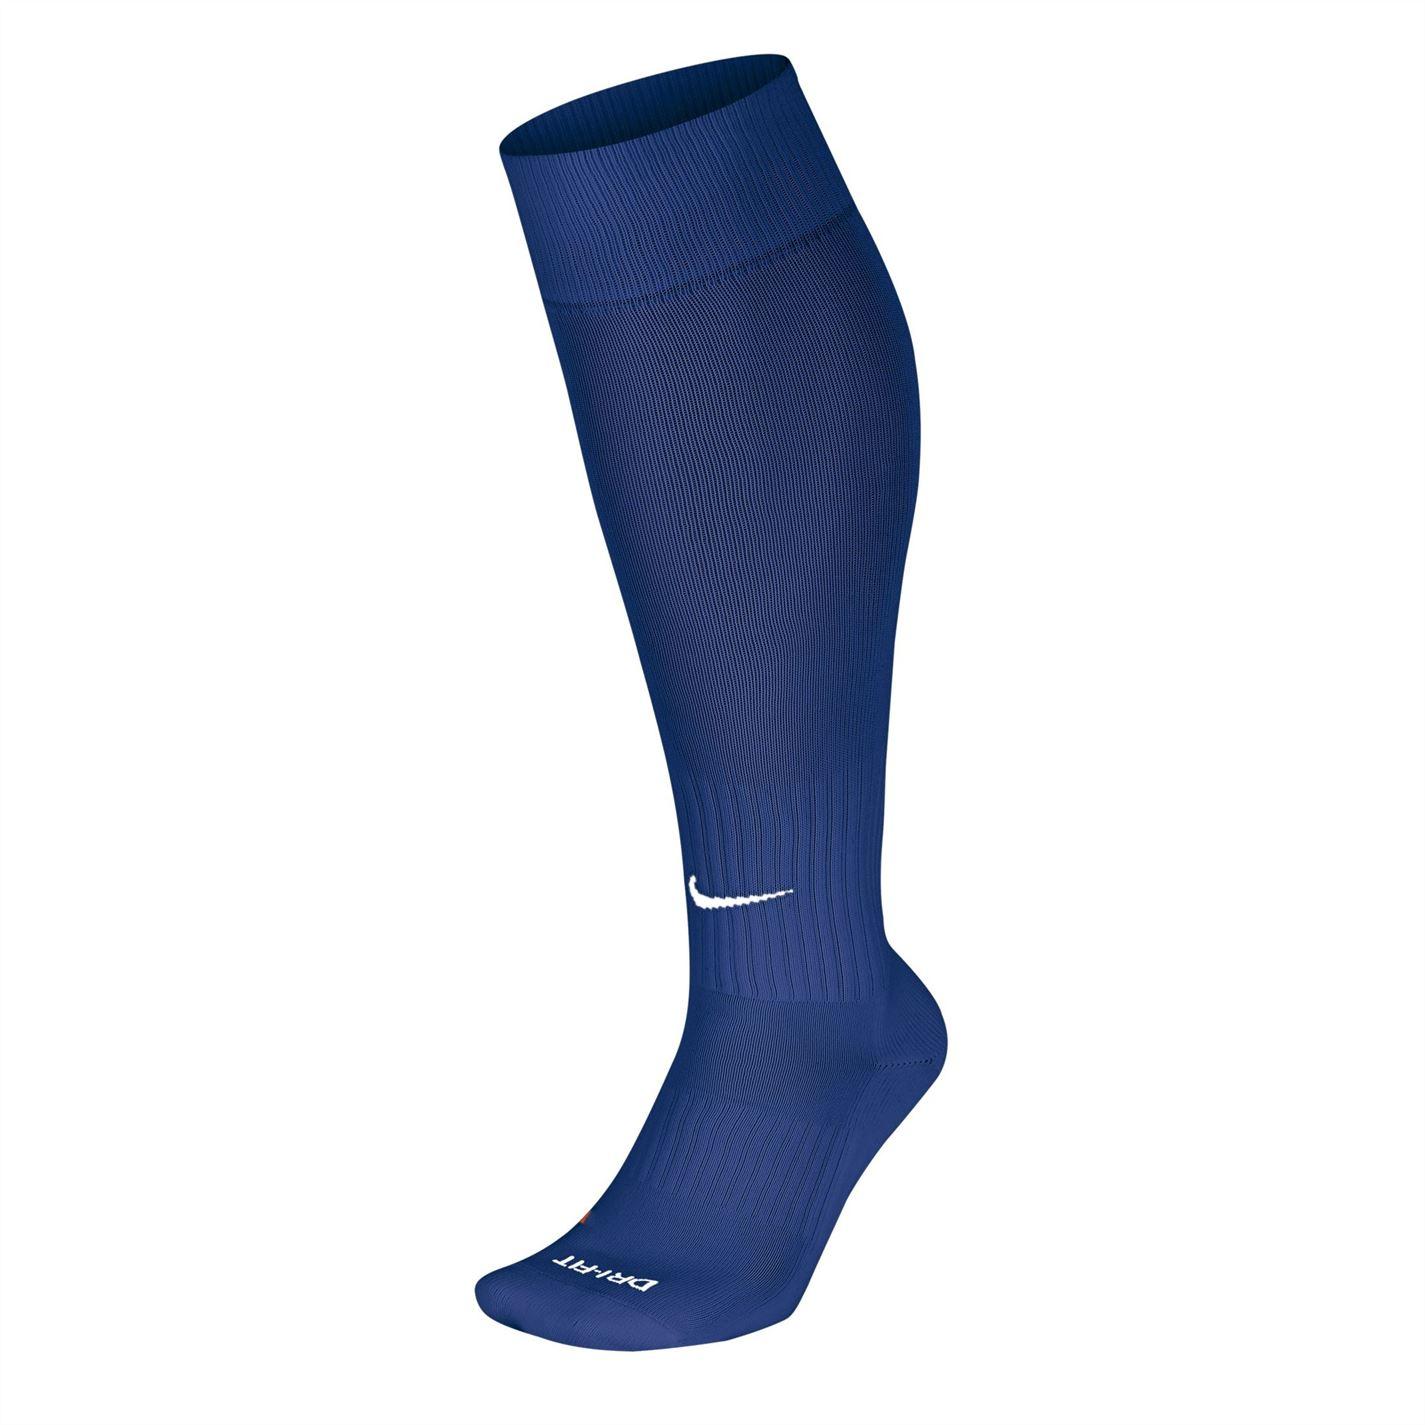 Nike Classic Football Socks Mens Royal